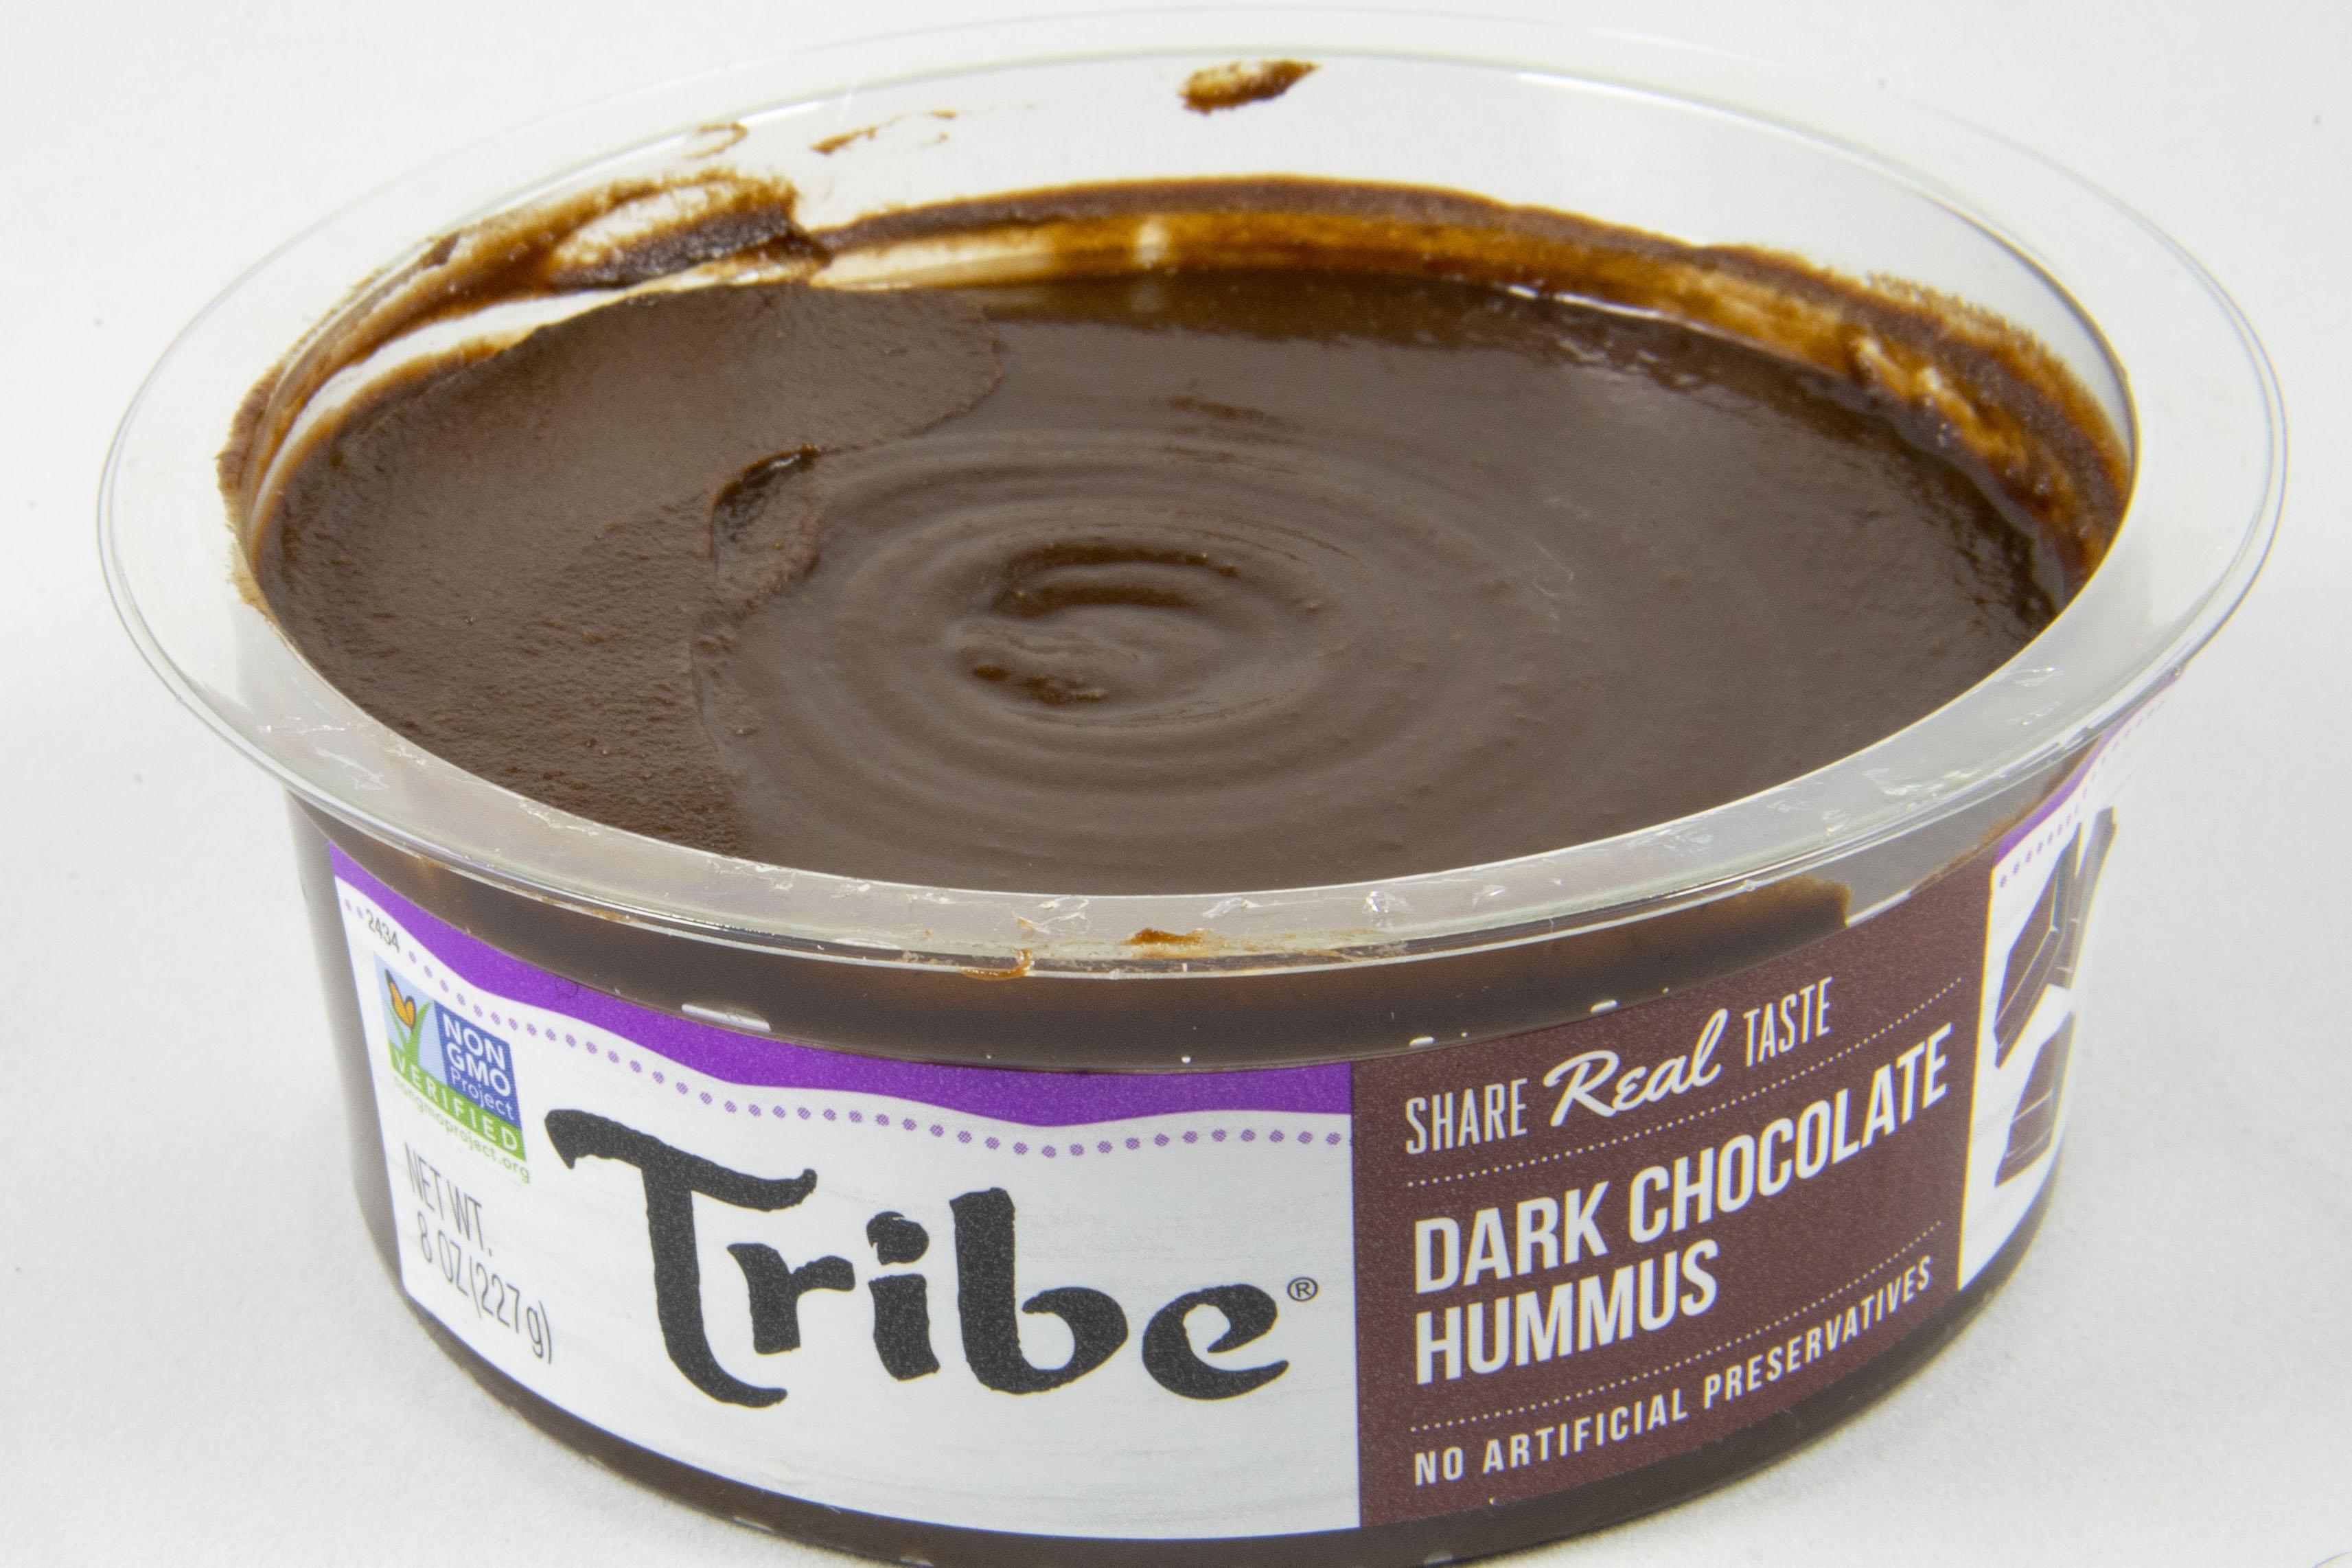 Tribe Dark Chocolate Hummus (8 oz., $3.99)